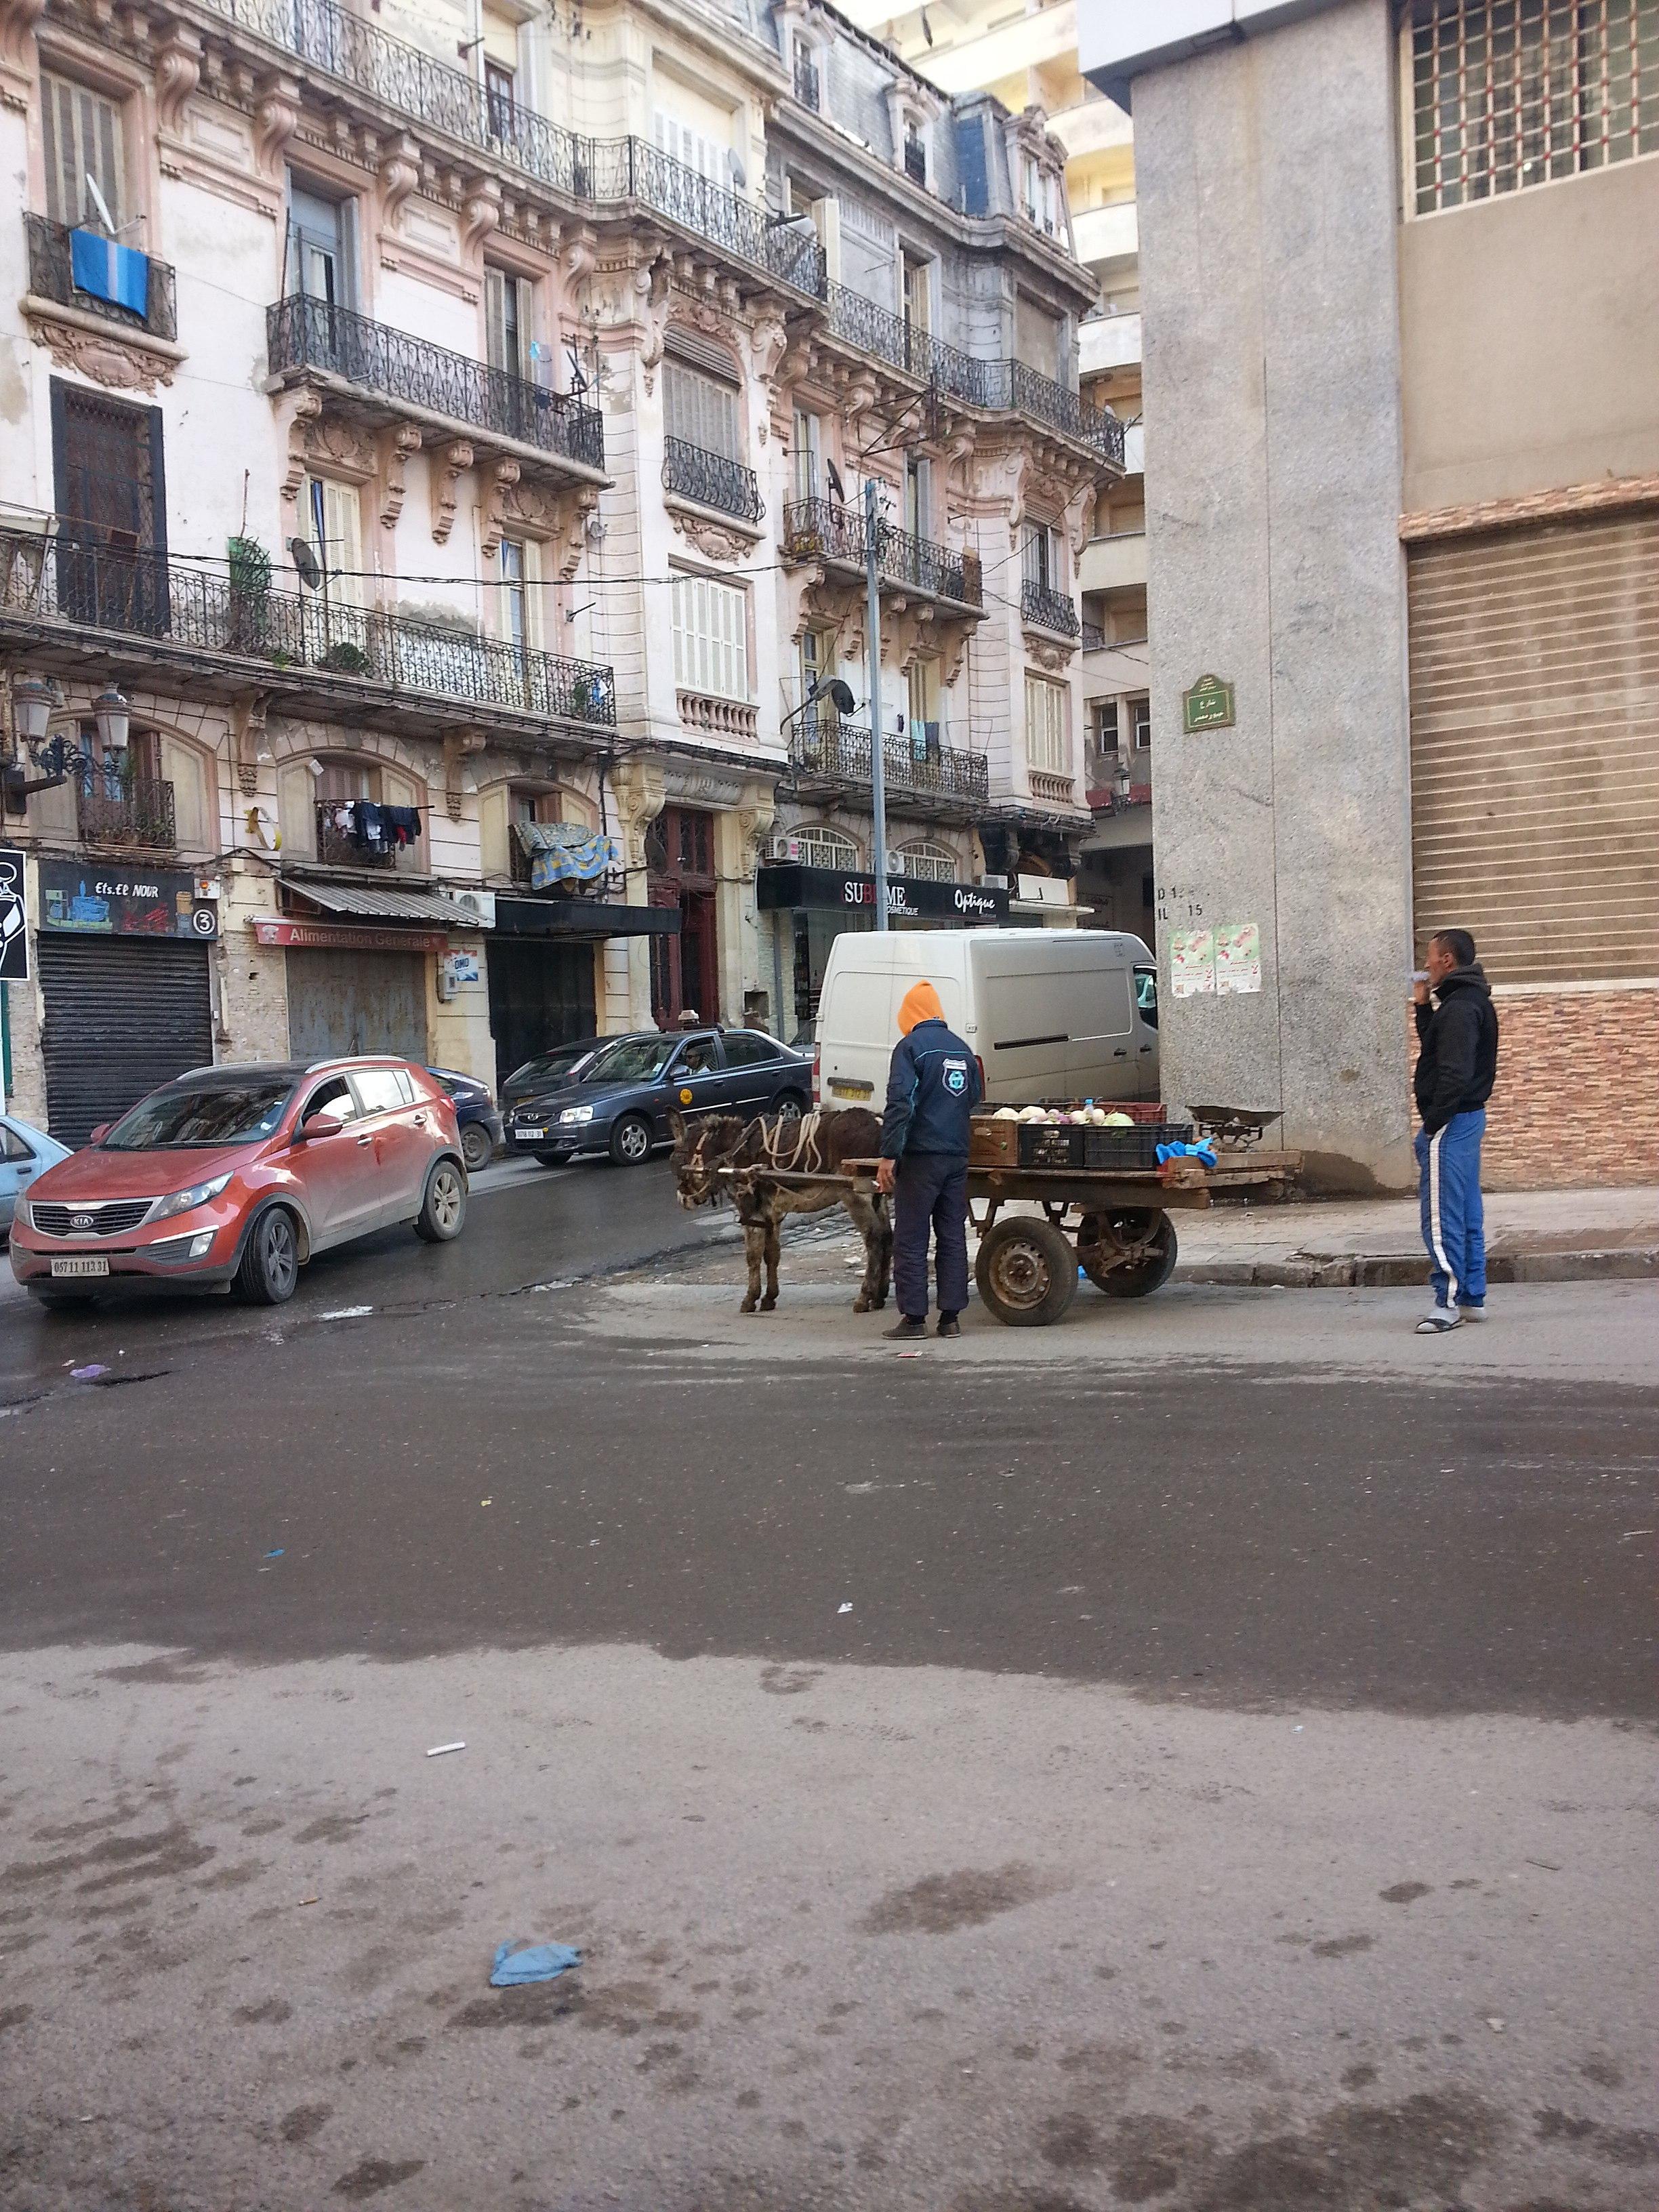 Caut casnice in Oran